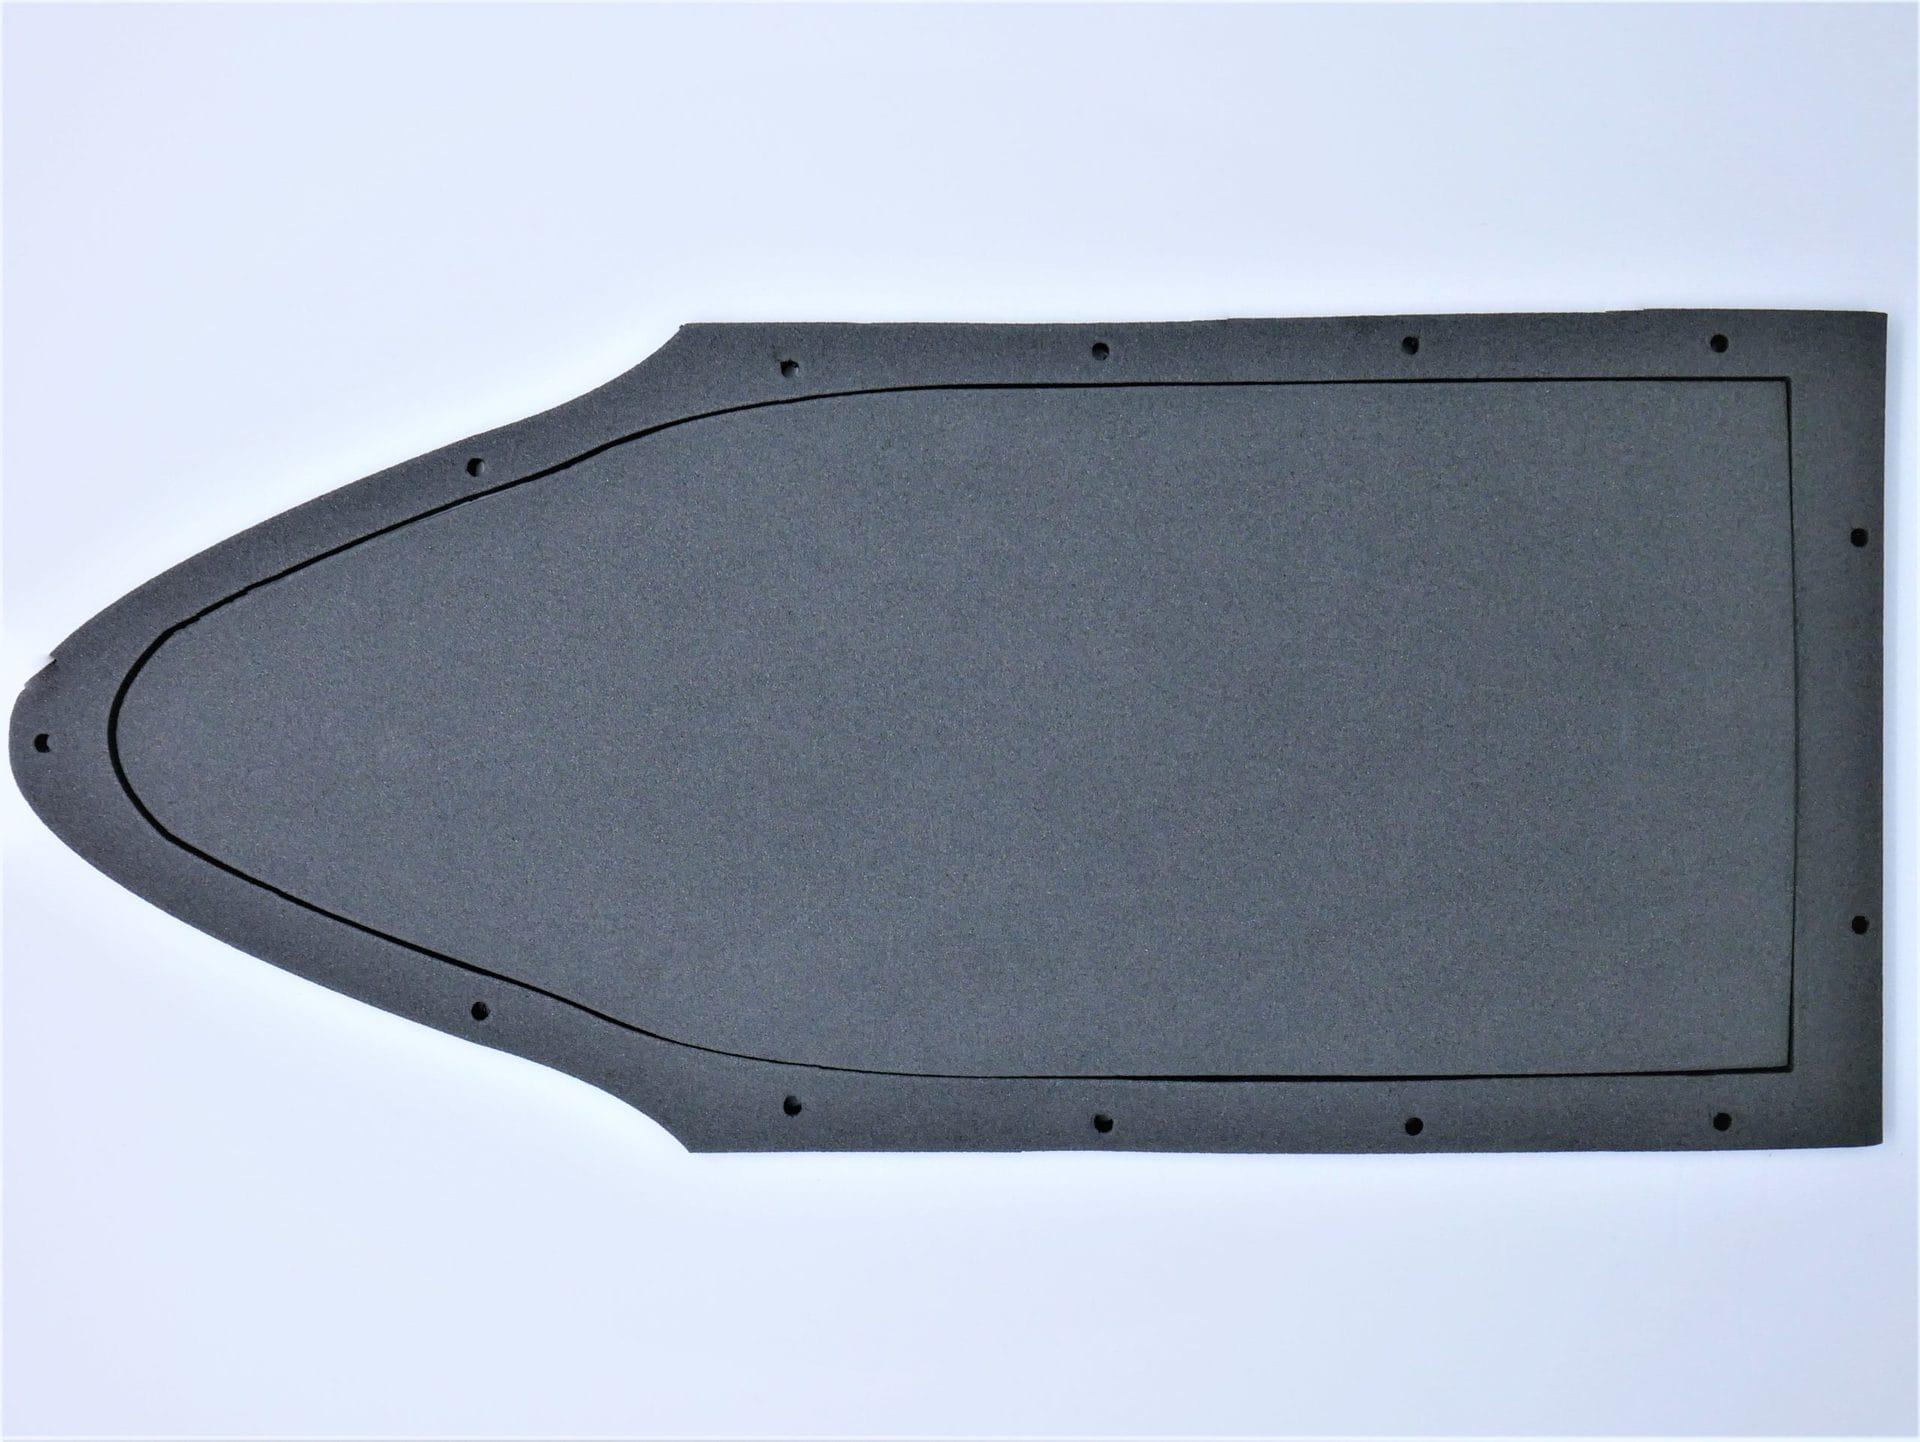 Cuta Copter EX-1 Canopy Seal